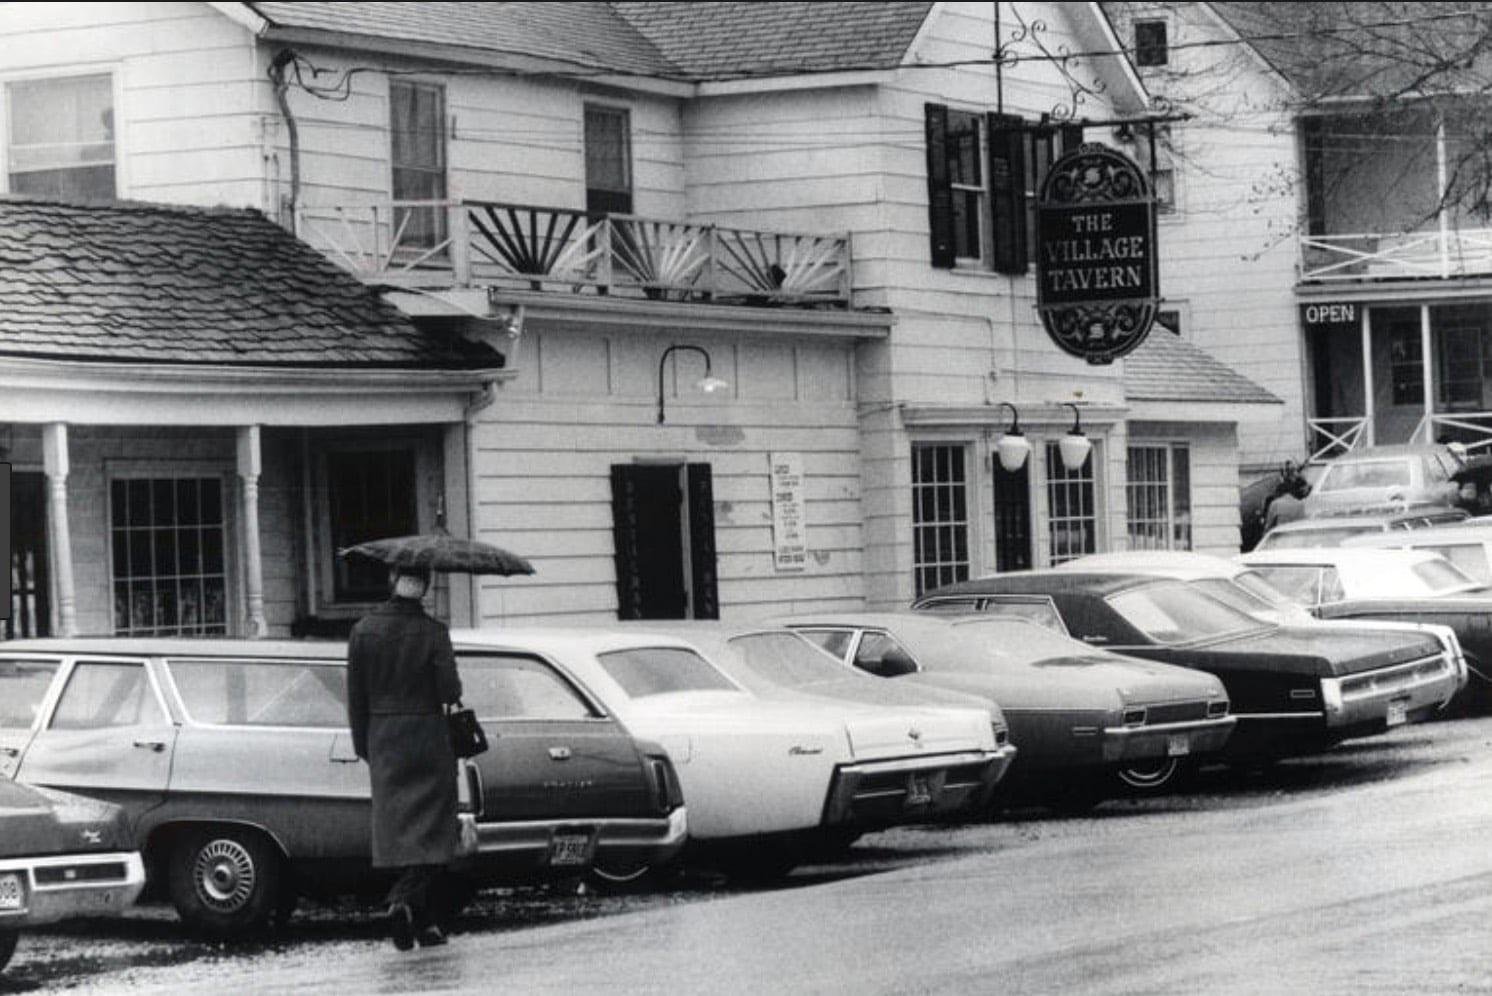 Long Grove Village Tavern